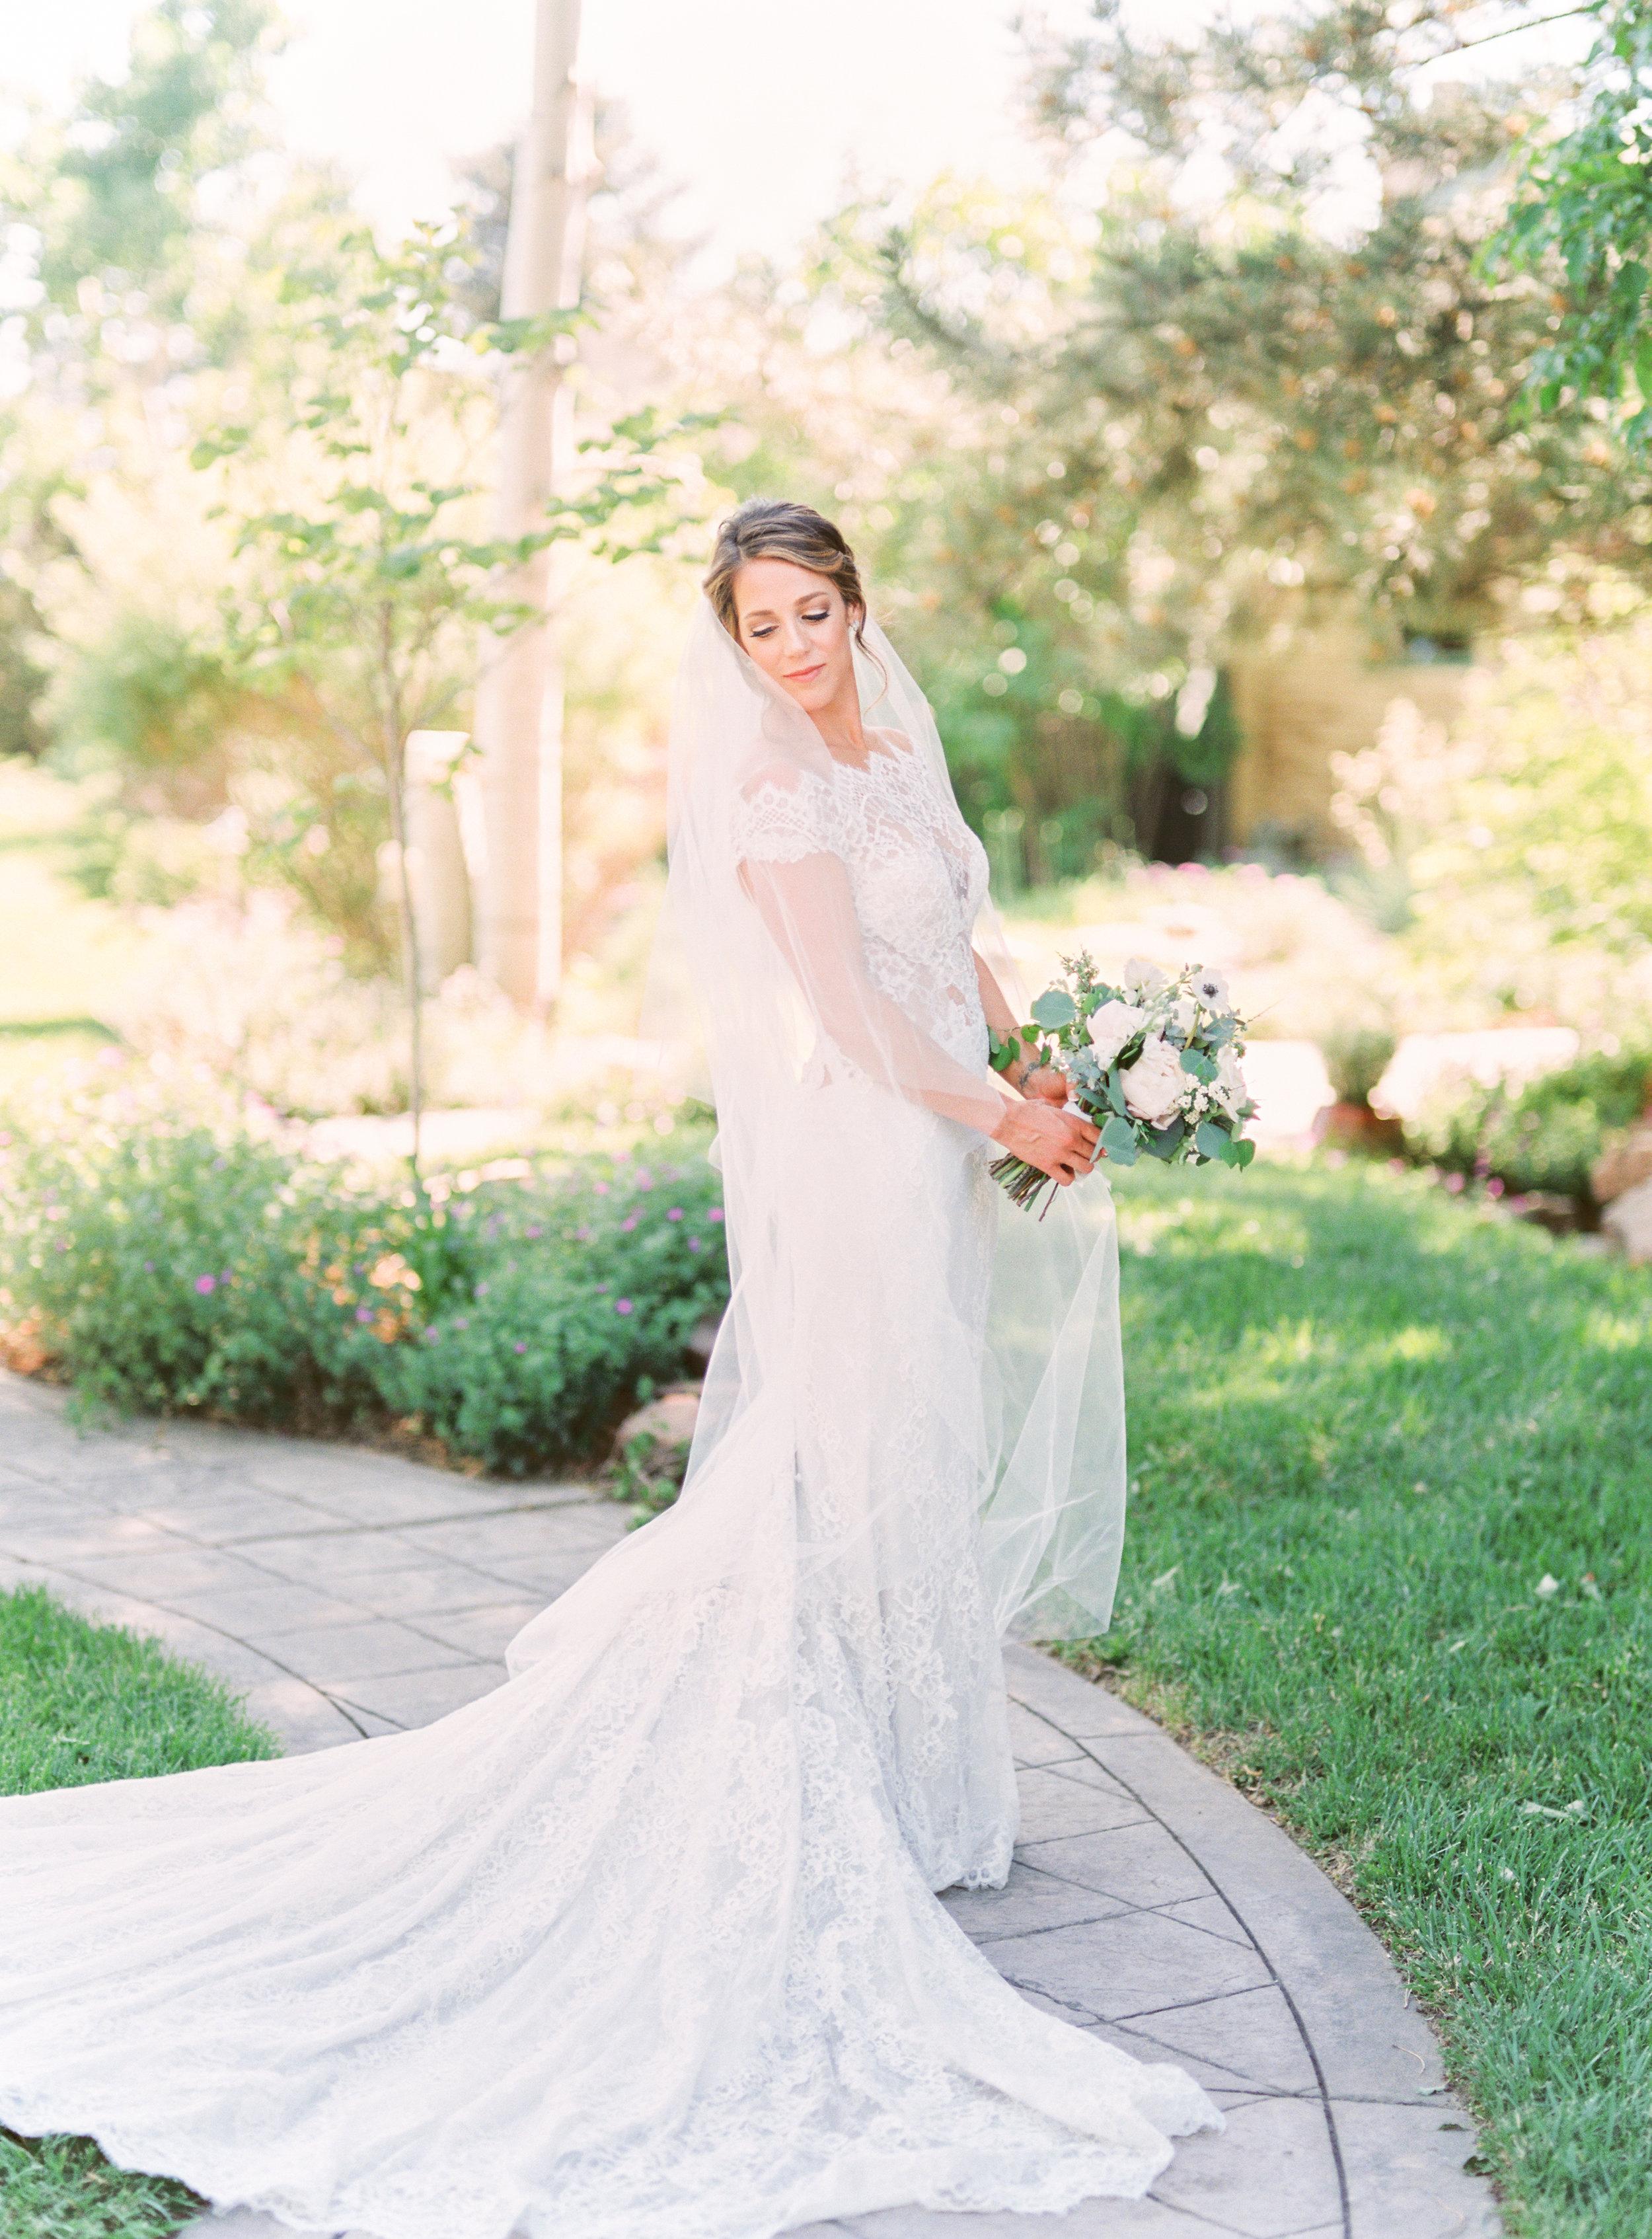 Kathryn-Allen-Boulder-wedding-2018-by-Lisa-ODwyer-147.jpg